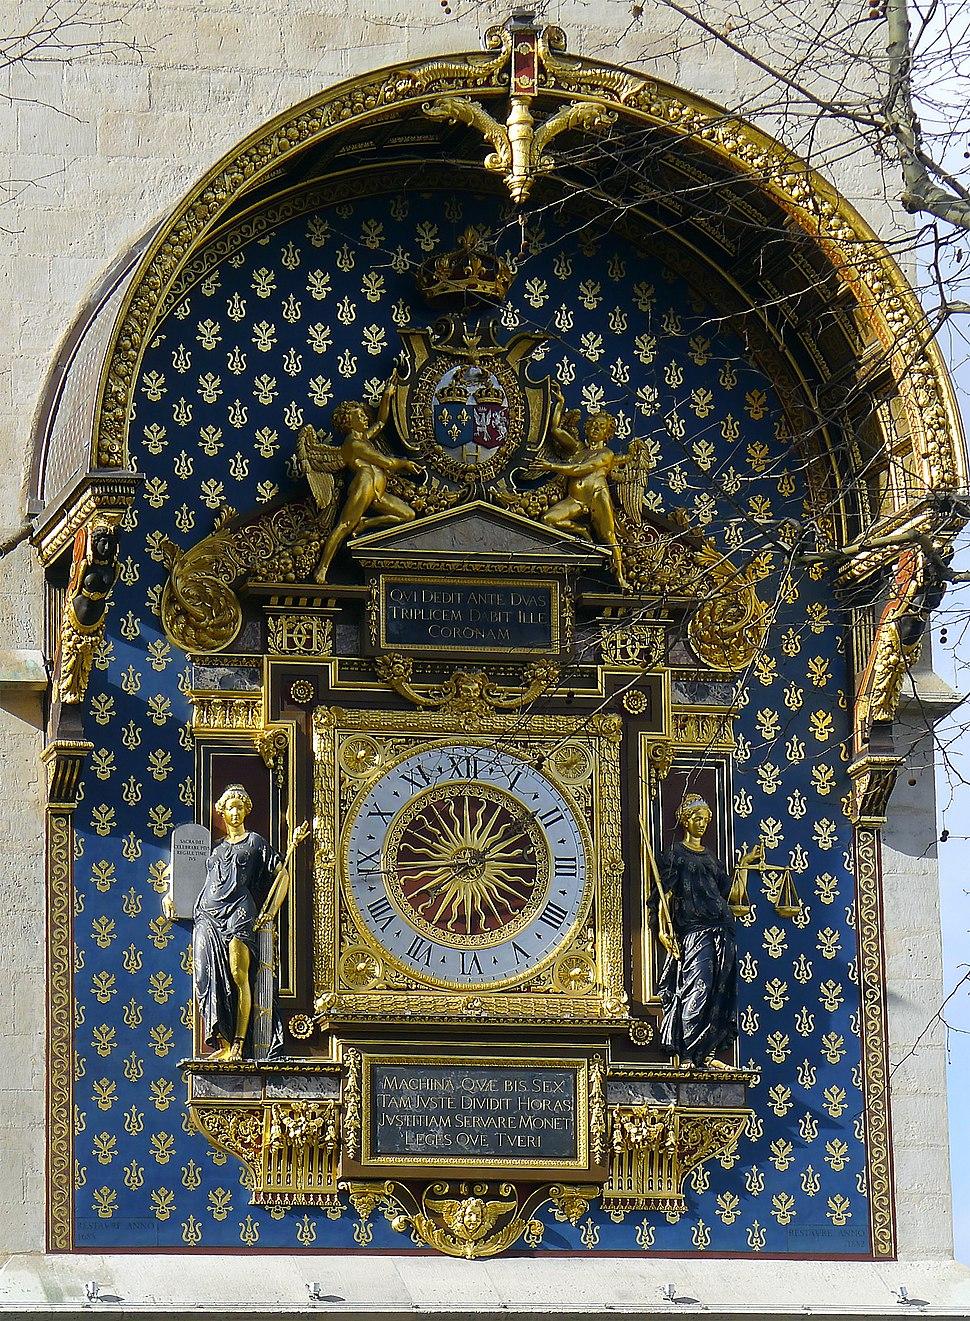 P1160446 Paris Ier Conciergerie Horloge rwk